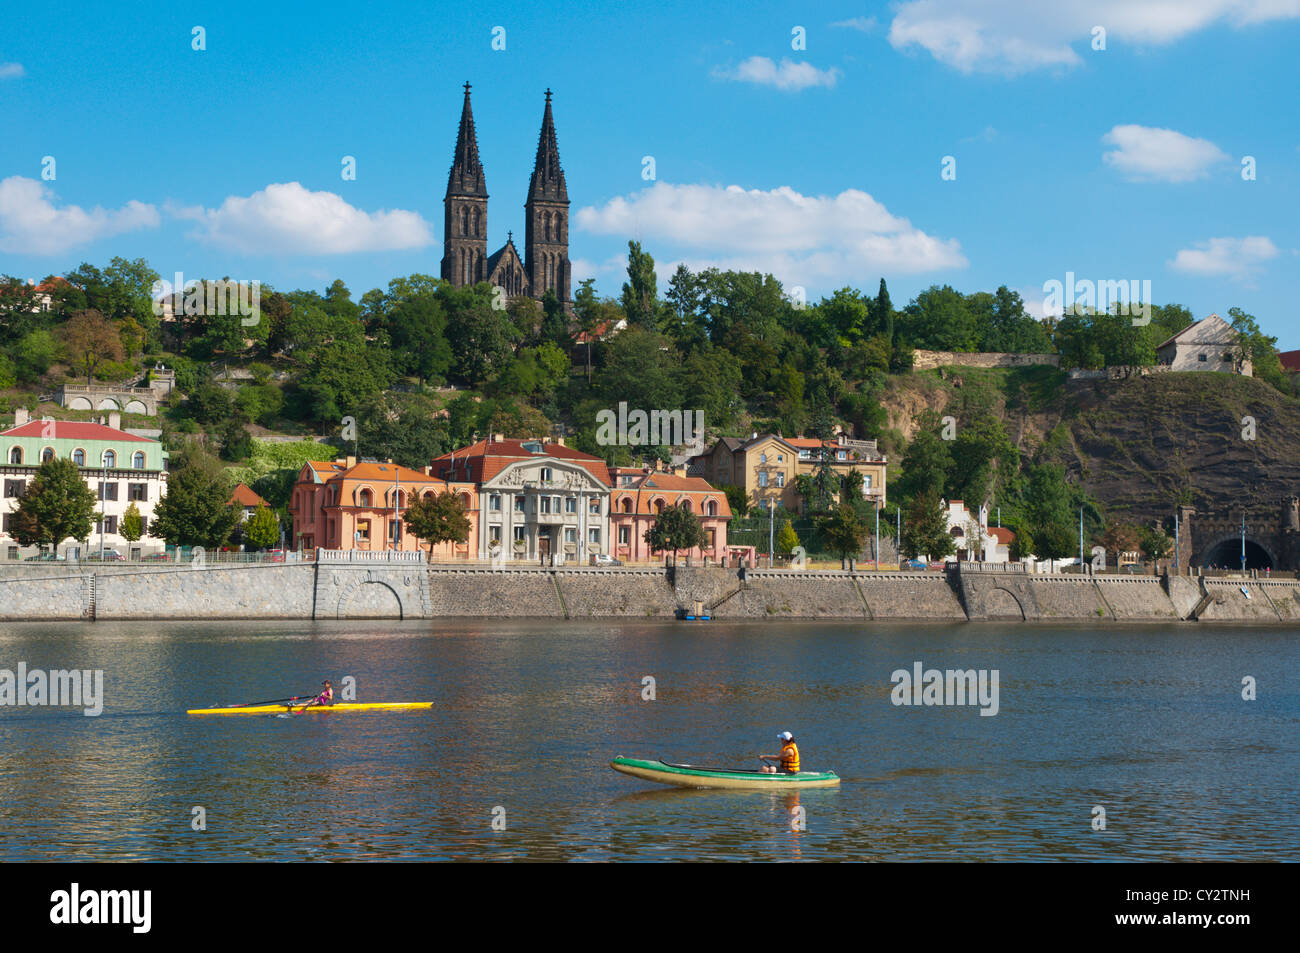 Vysehrad hill by Vltava riverside central Prague Czech Republic Europe - Stock Image